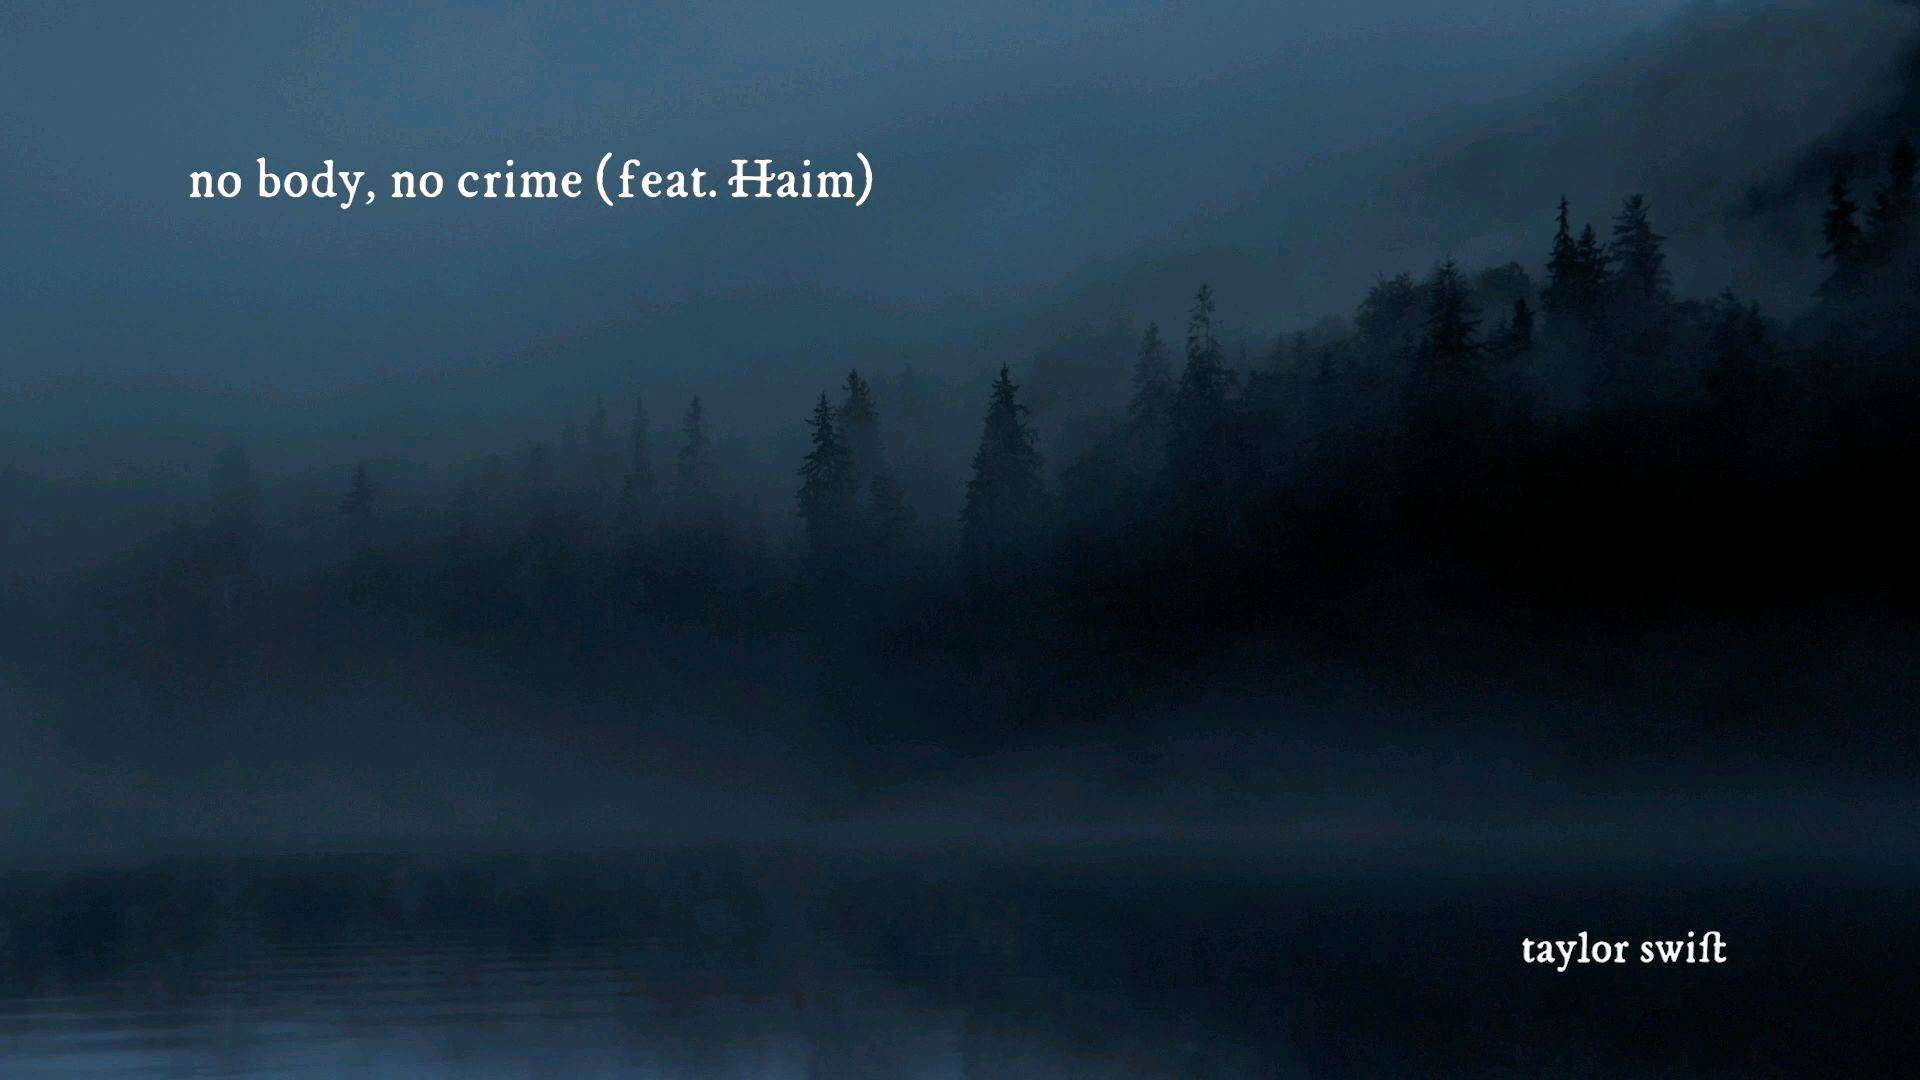 Taylor Swift - no body, no crime